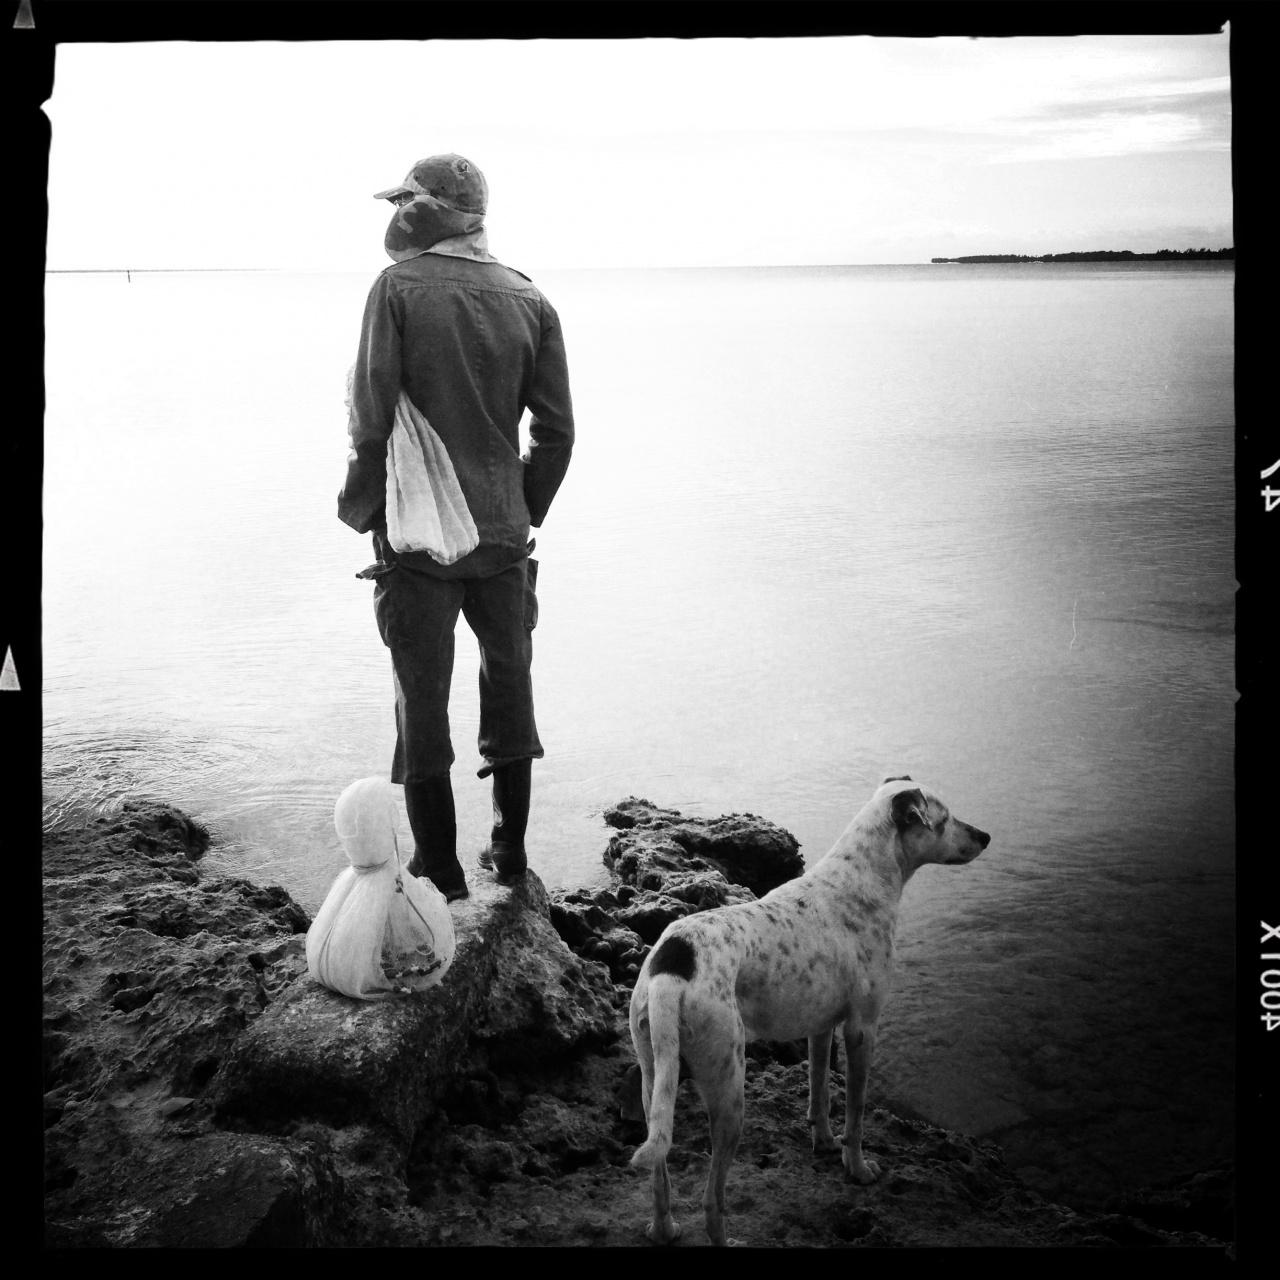 Fisherman and his dog